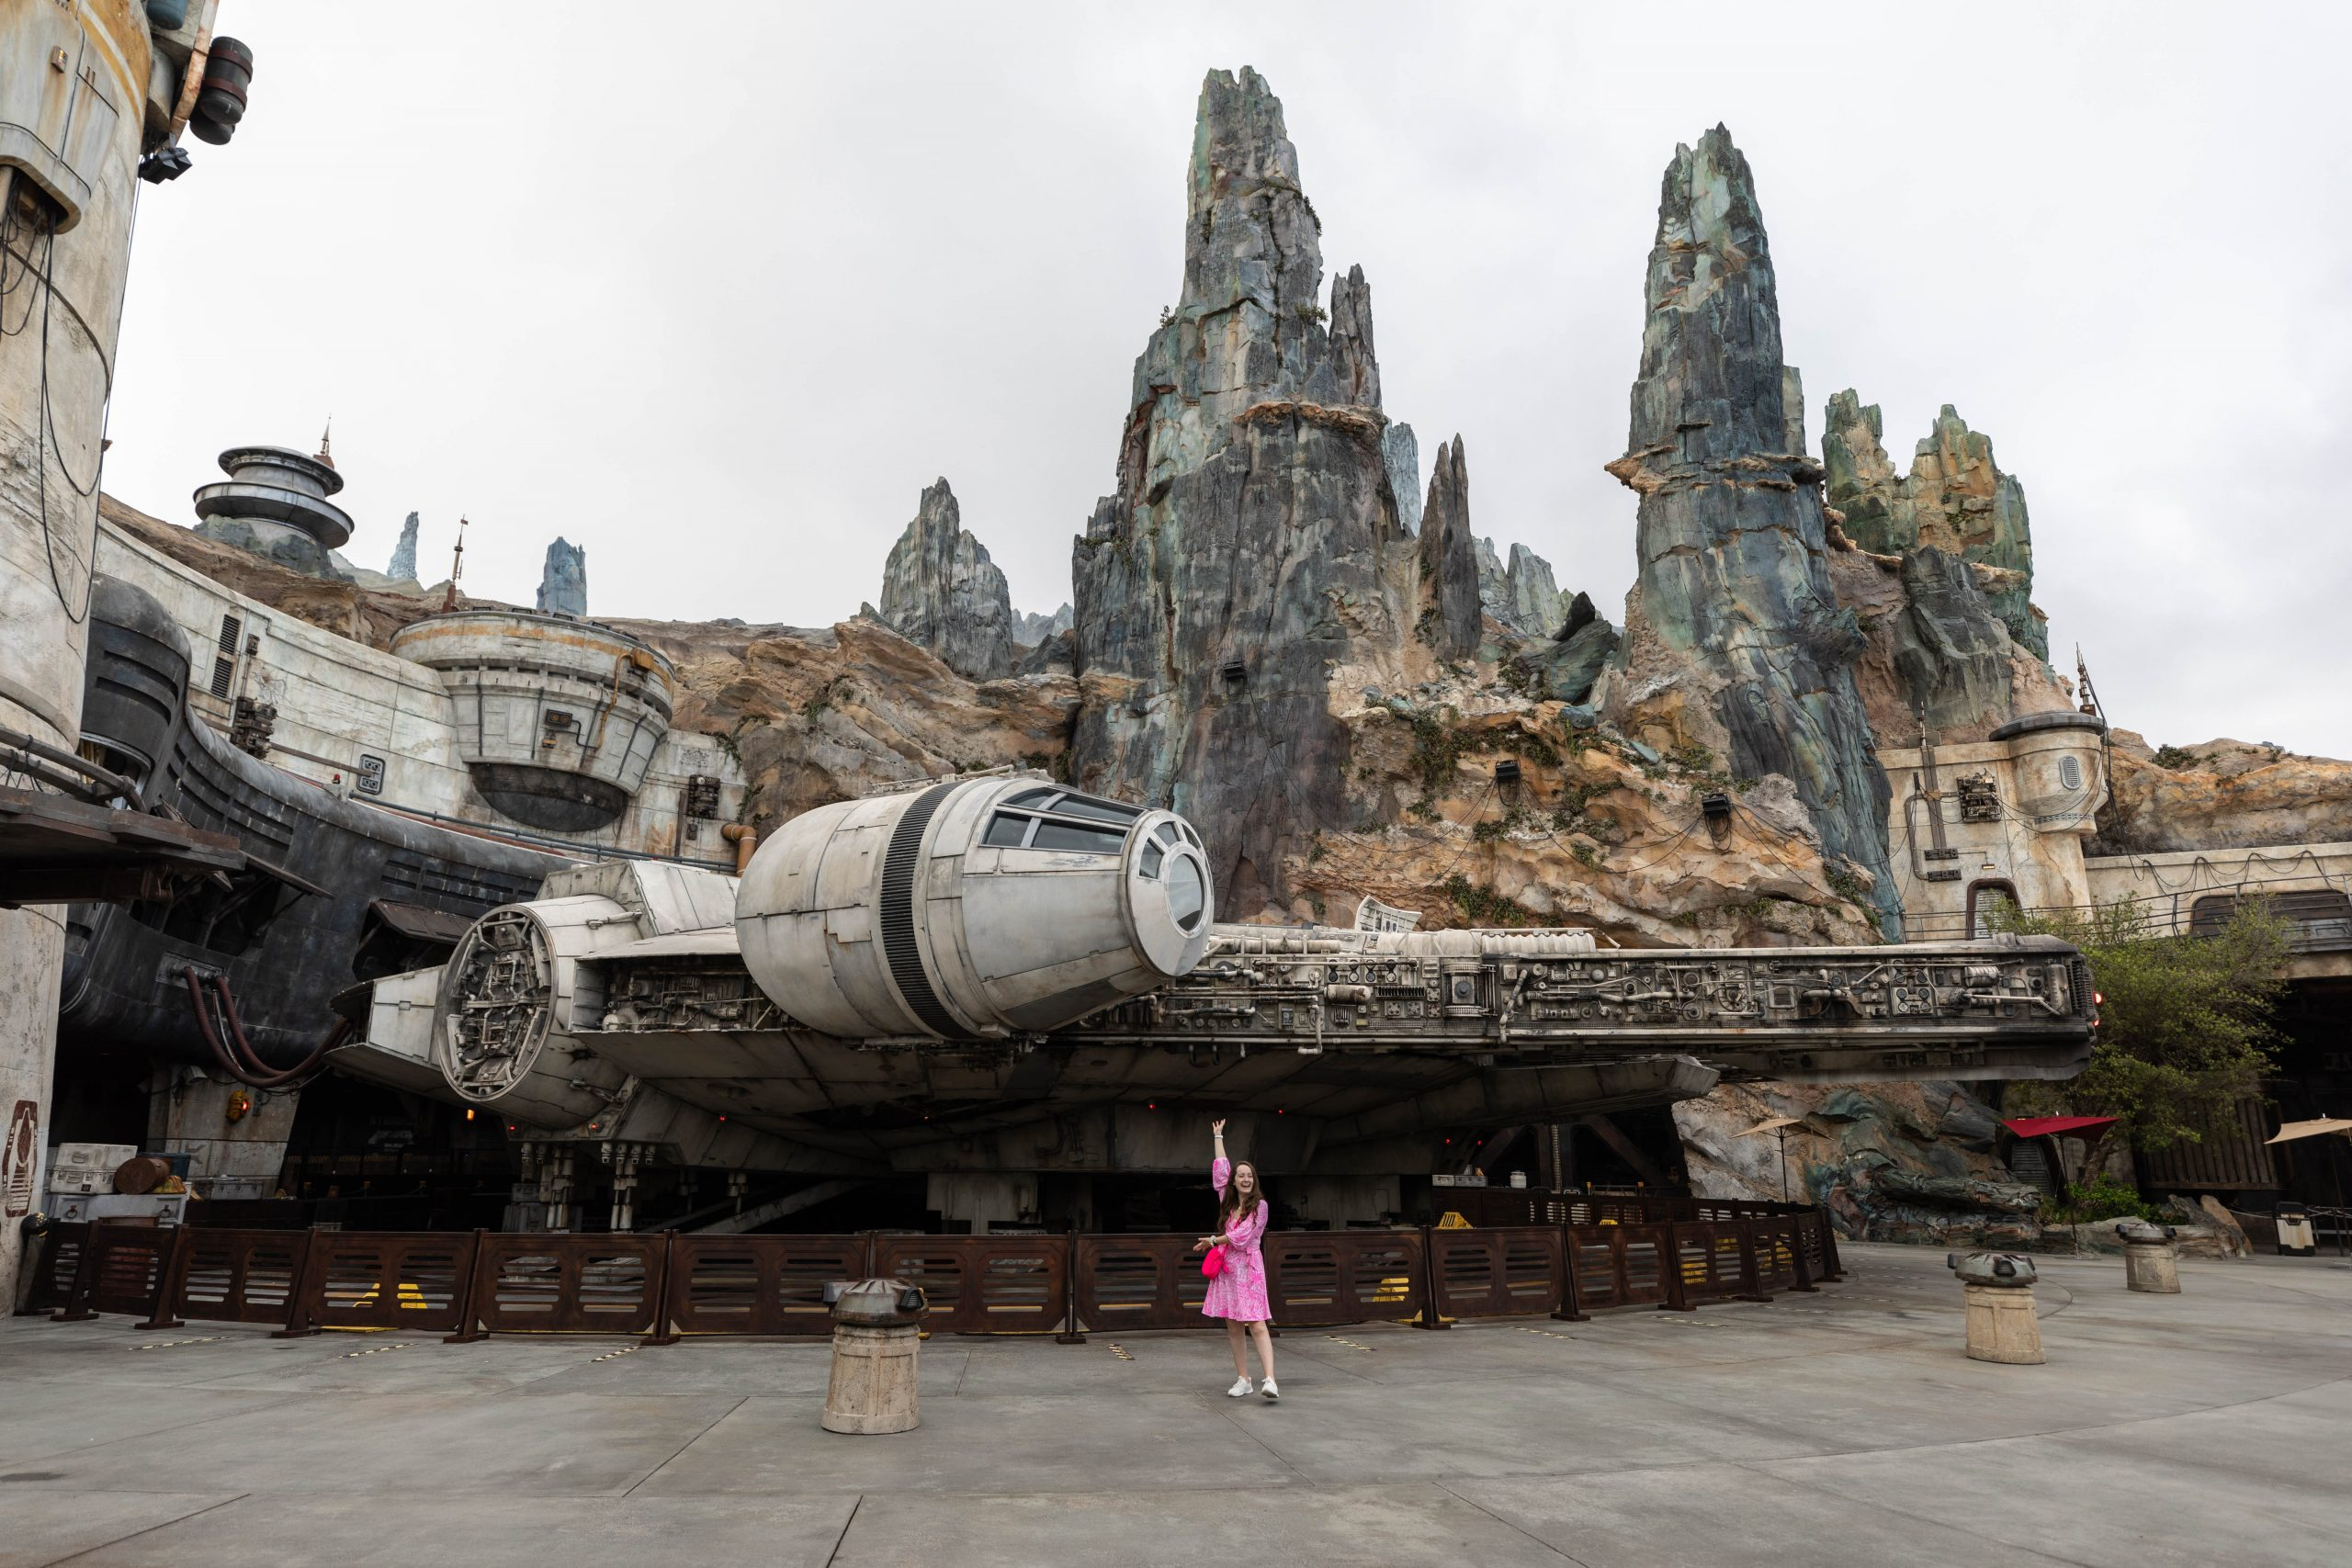 Millenium Falcon Lilly Pulitzer Dress at Private Tour of Galaxy's Edge Hollywood Studio Walt Disney World Annie Fairfax